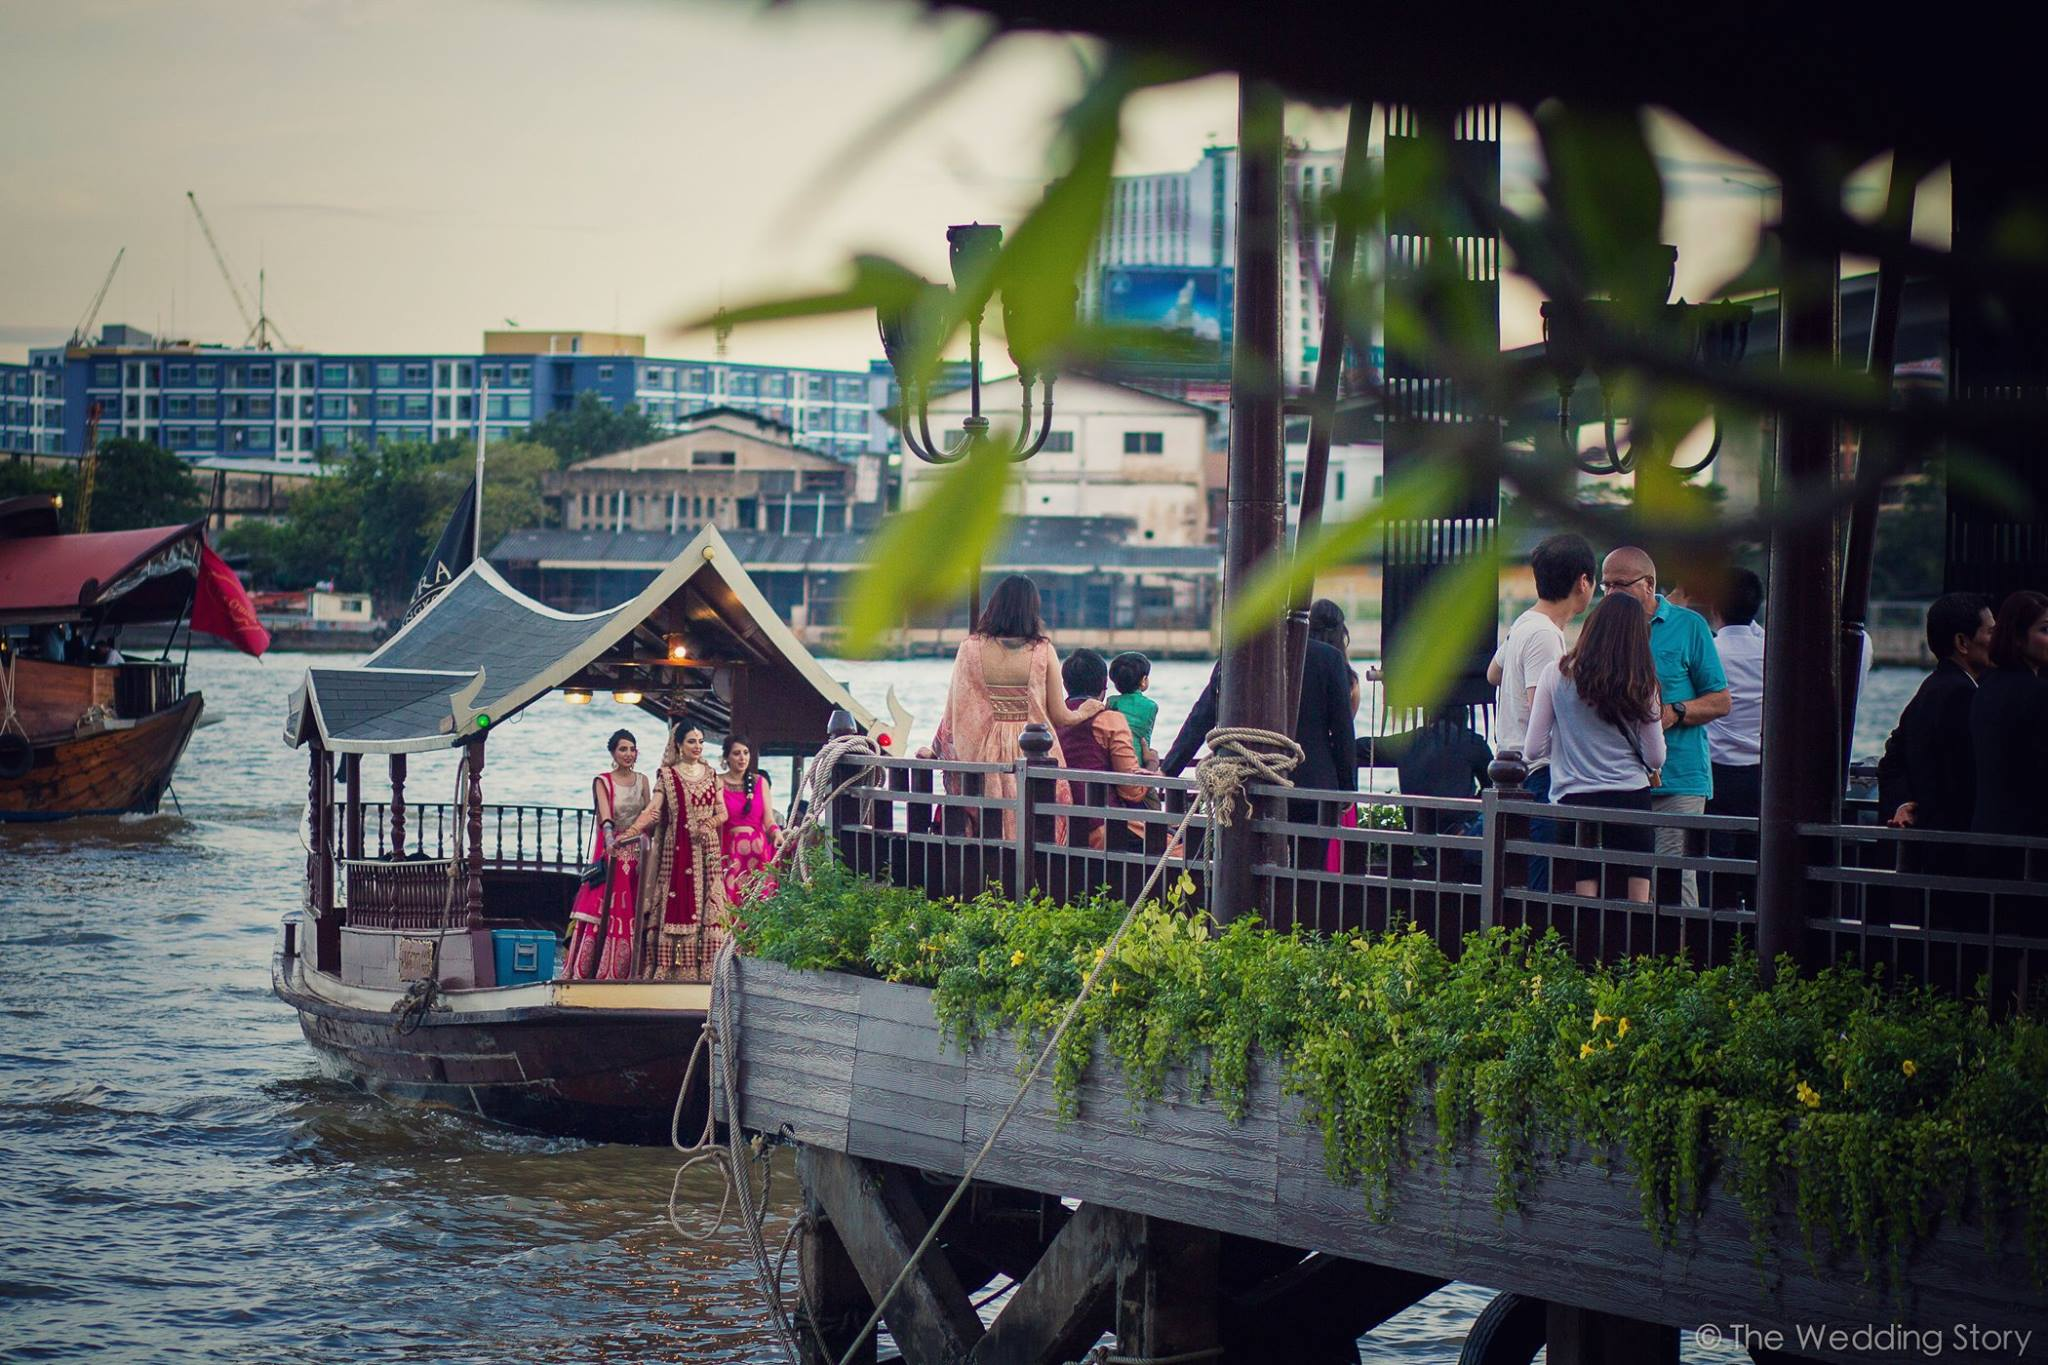 bride entry, bridal entry on boat, destination wedding ideas, bridal lehenga